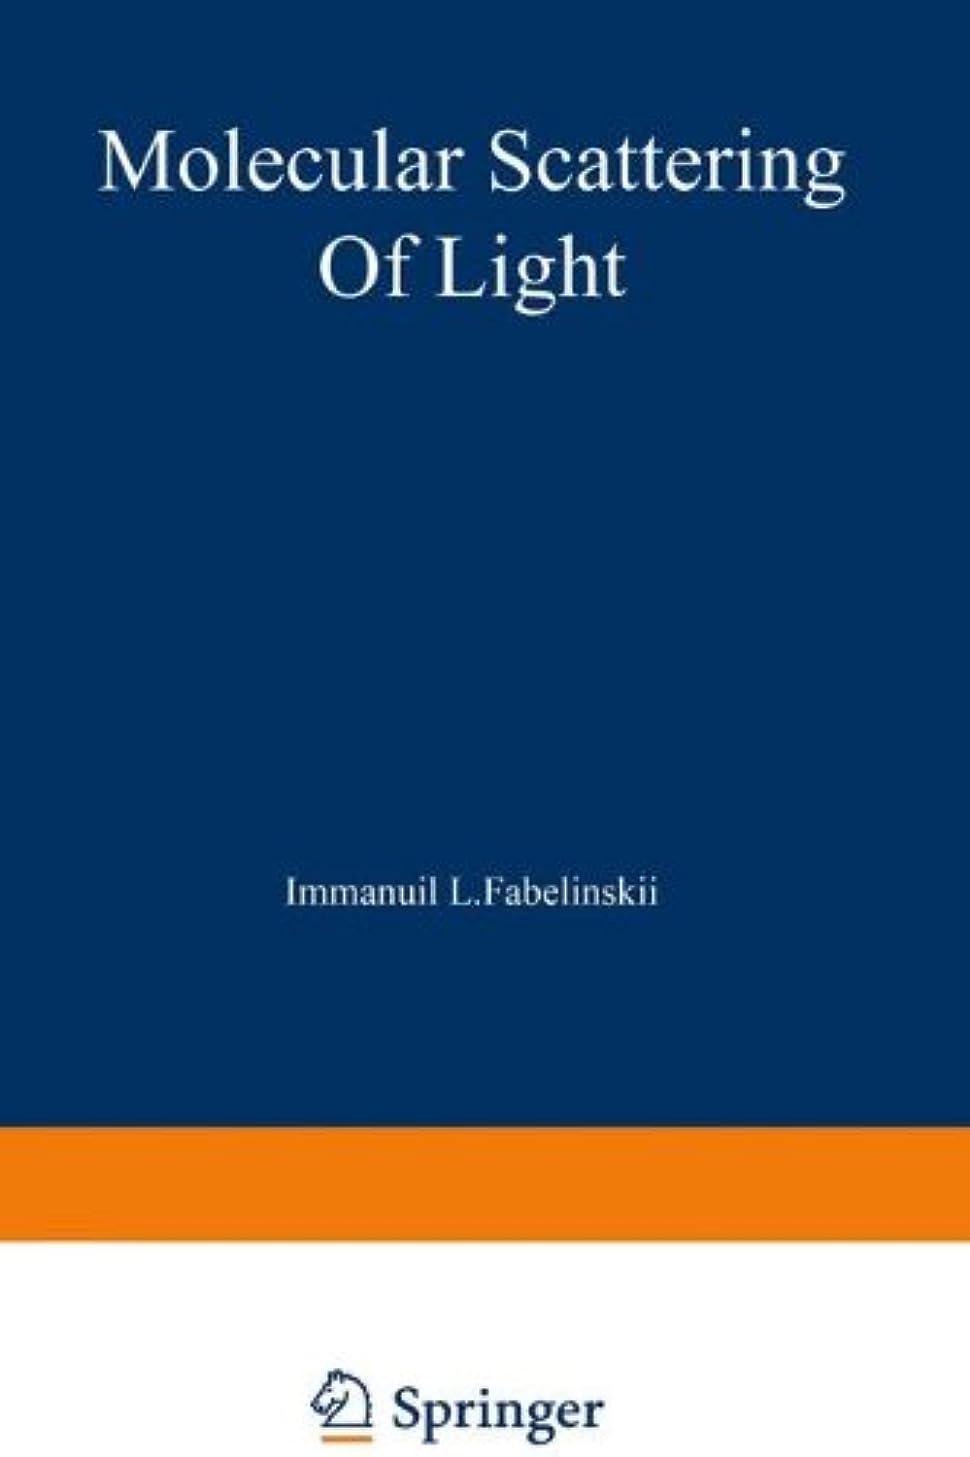 軽減詳細な優先権Molecular Scattering of Light